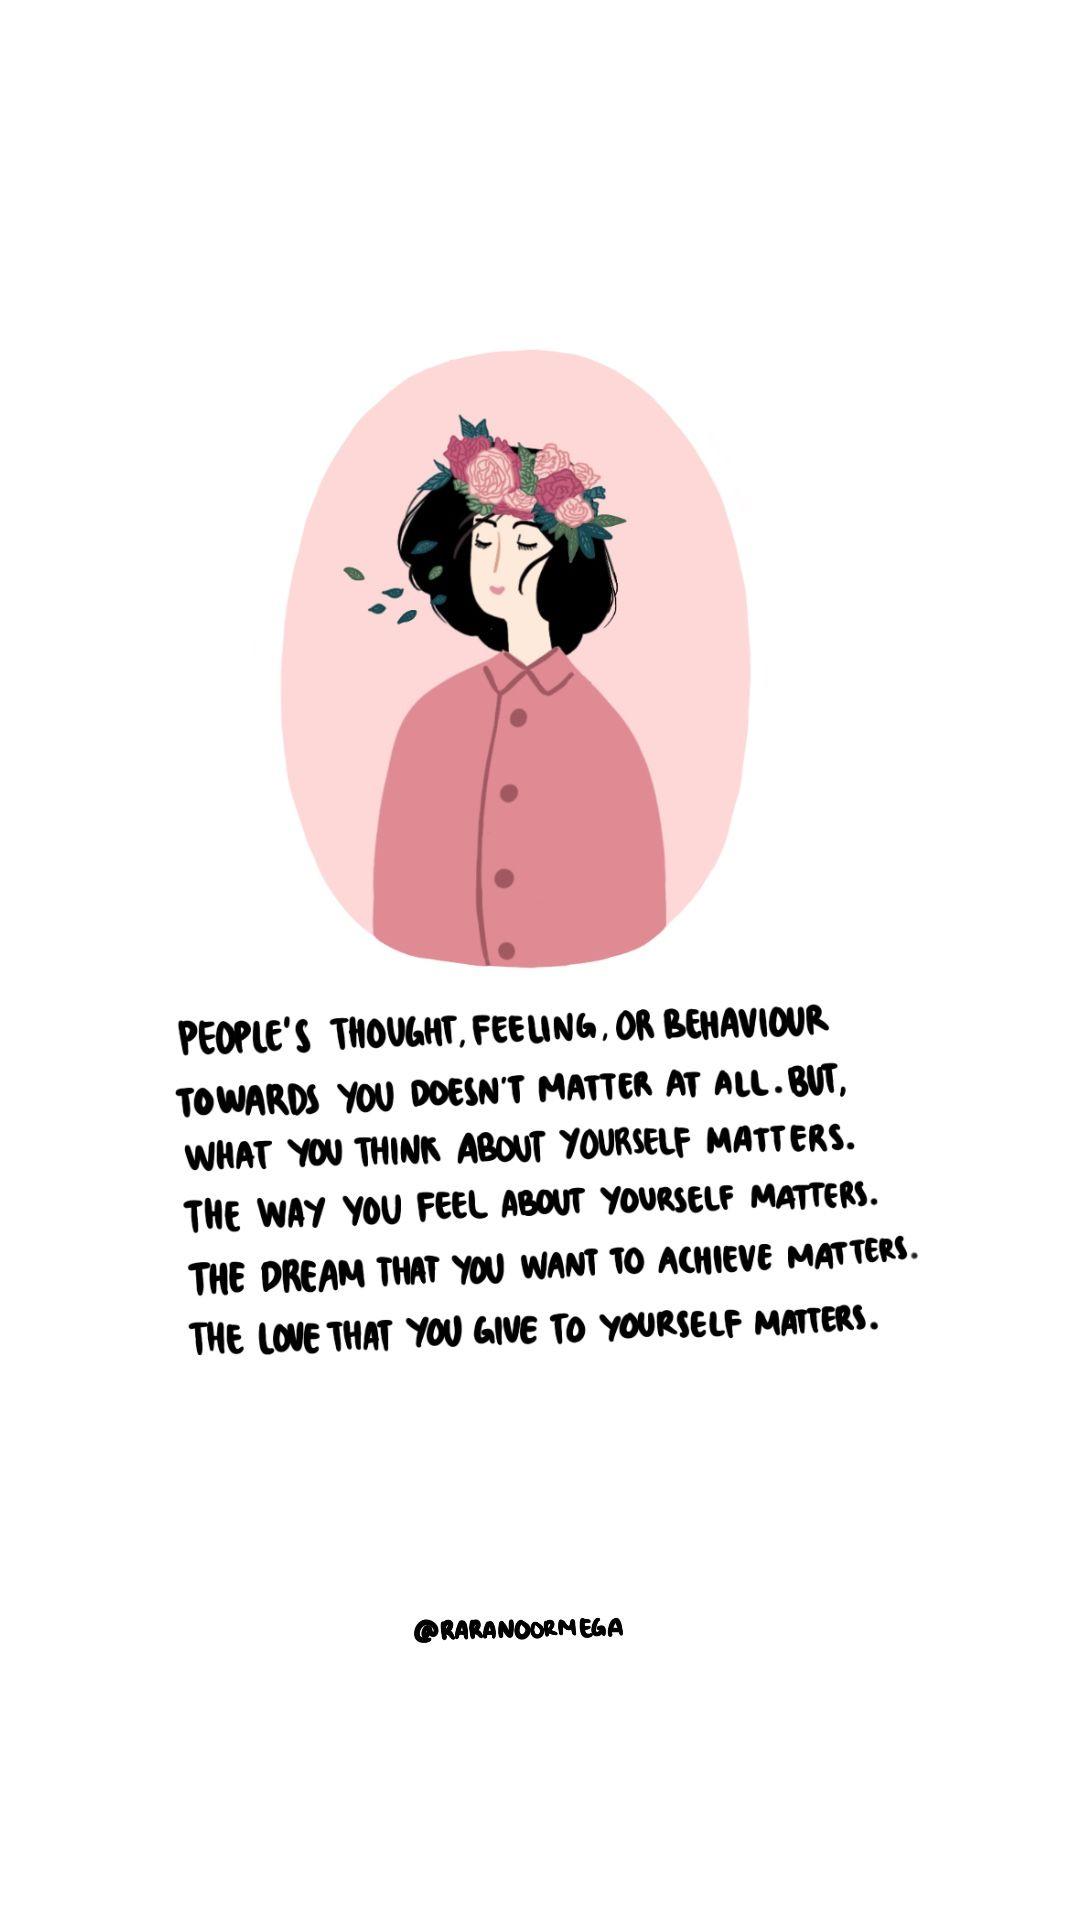 Projectinnervoice Reminder Quotes Motivational Art Quotes Appreciation Quotes